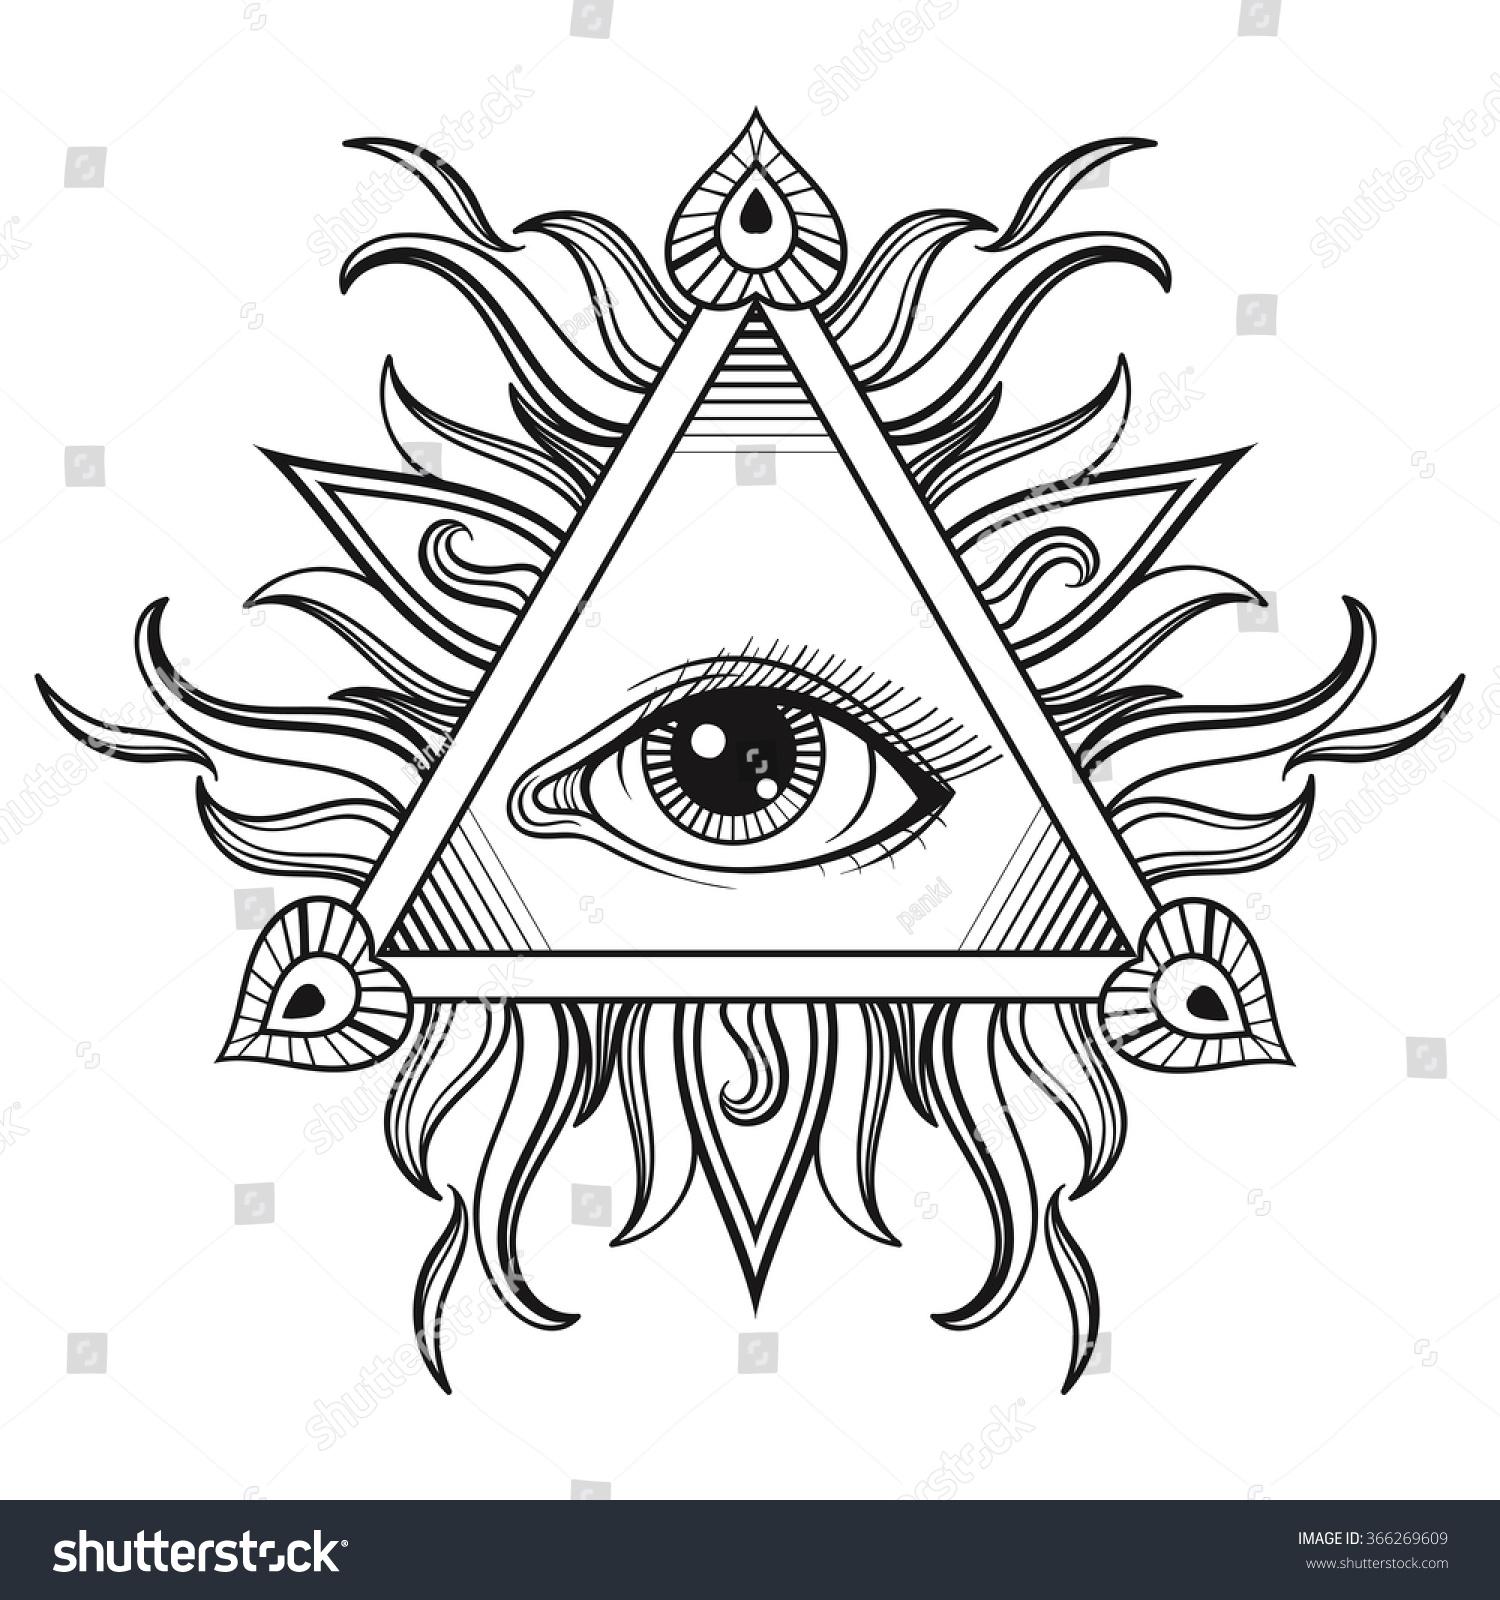 All Seeing Eye Pyramid Symbol In Tattoo Stock Photo 366269609